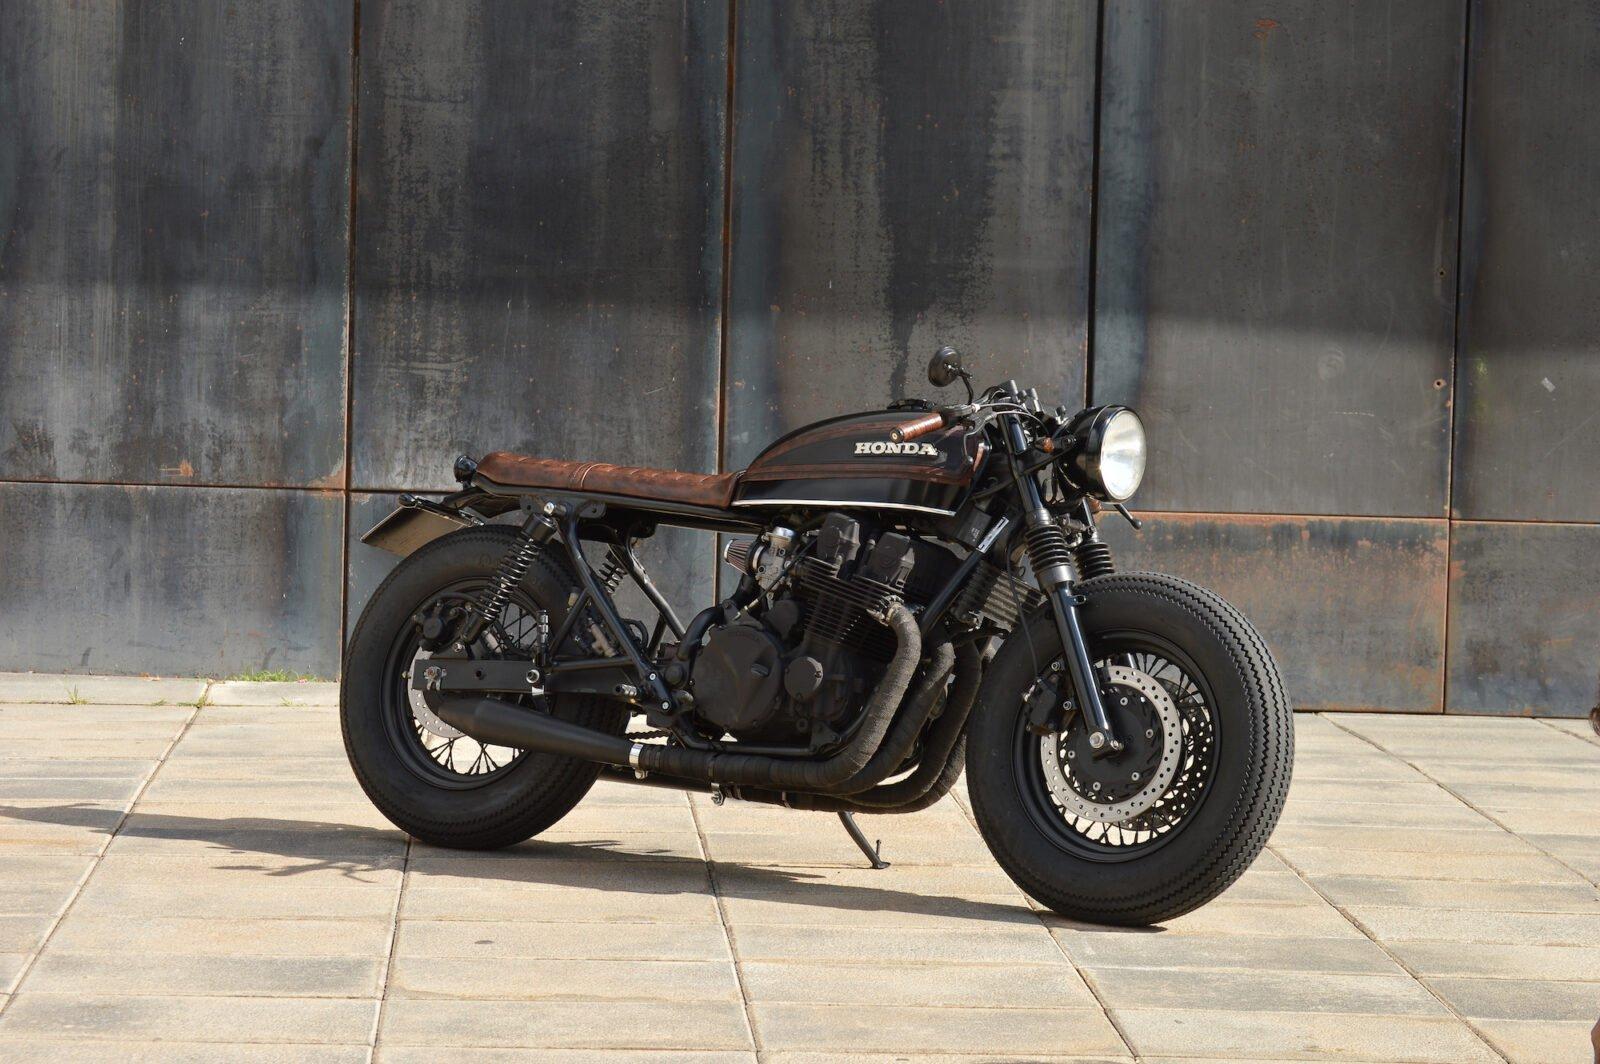 Honda CB750 Brat Style 1600x1064 - Overbold Motor Co. Honda CB750